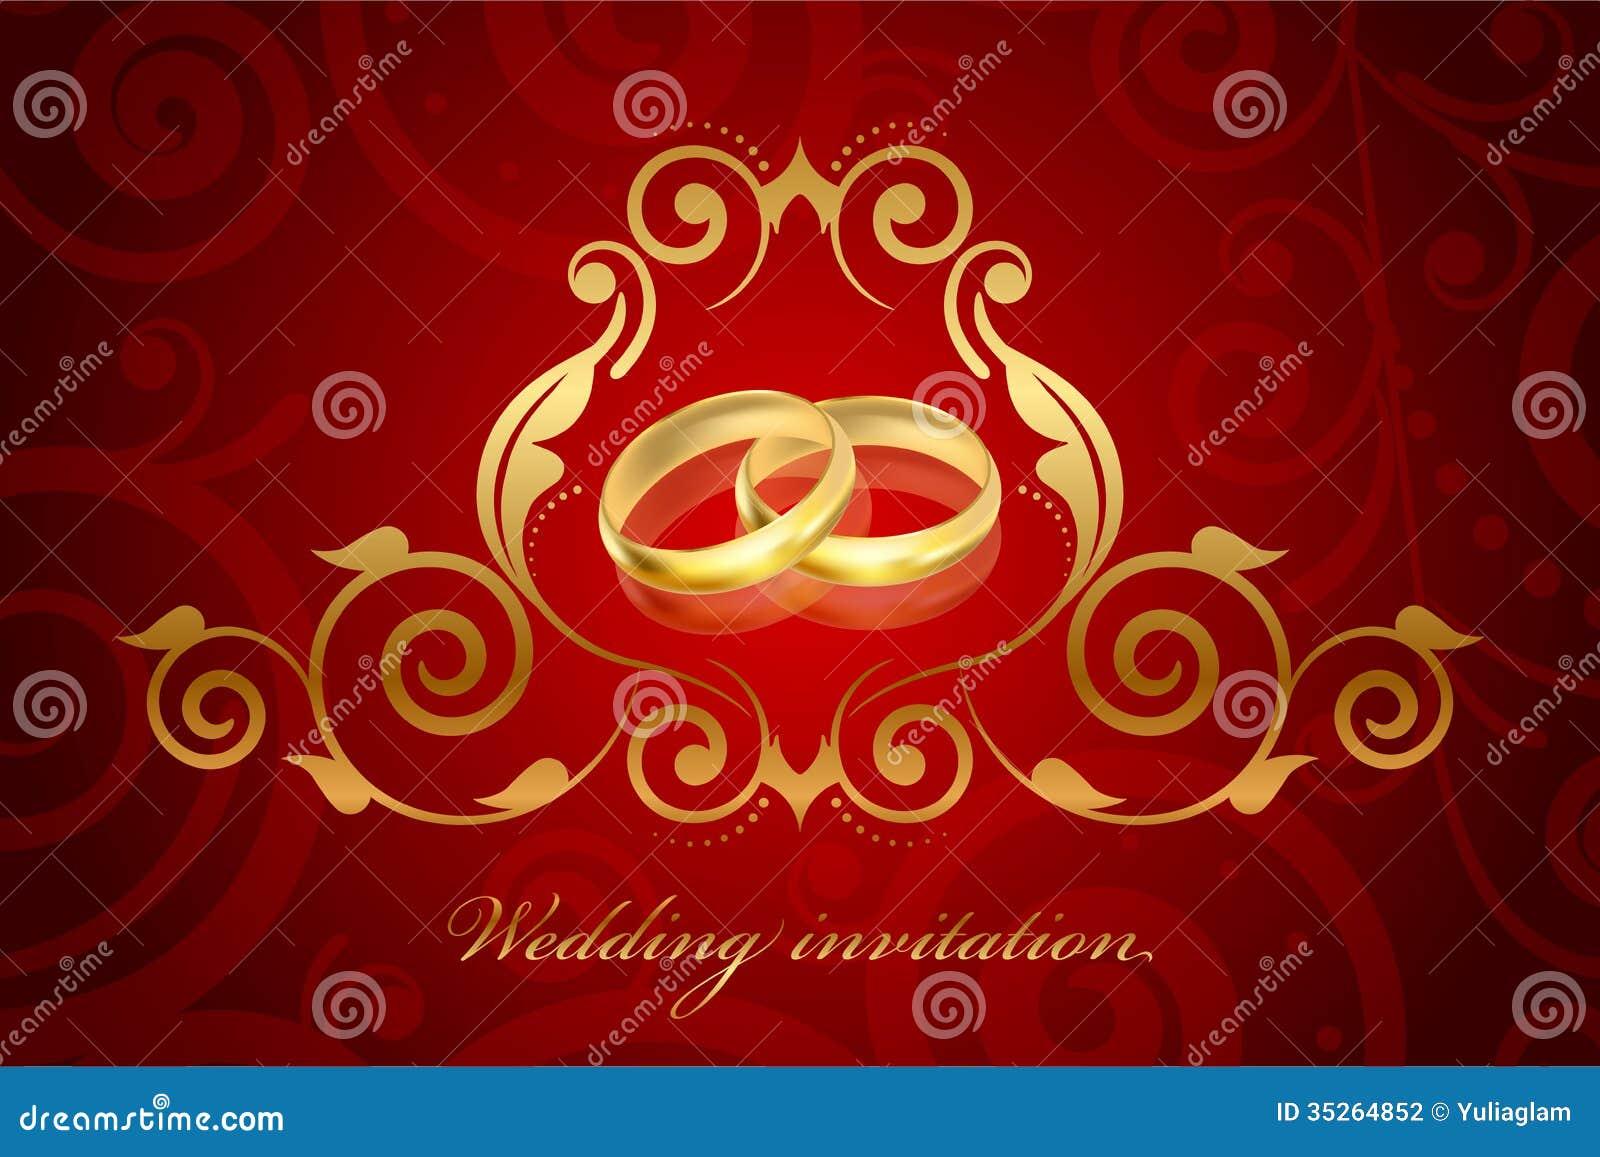 Vintage Gold Wedding Invitations - Weddings Gallery